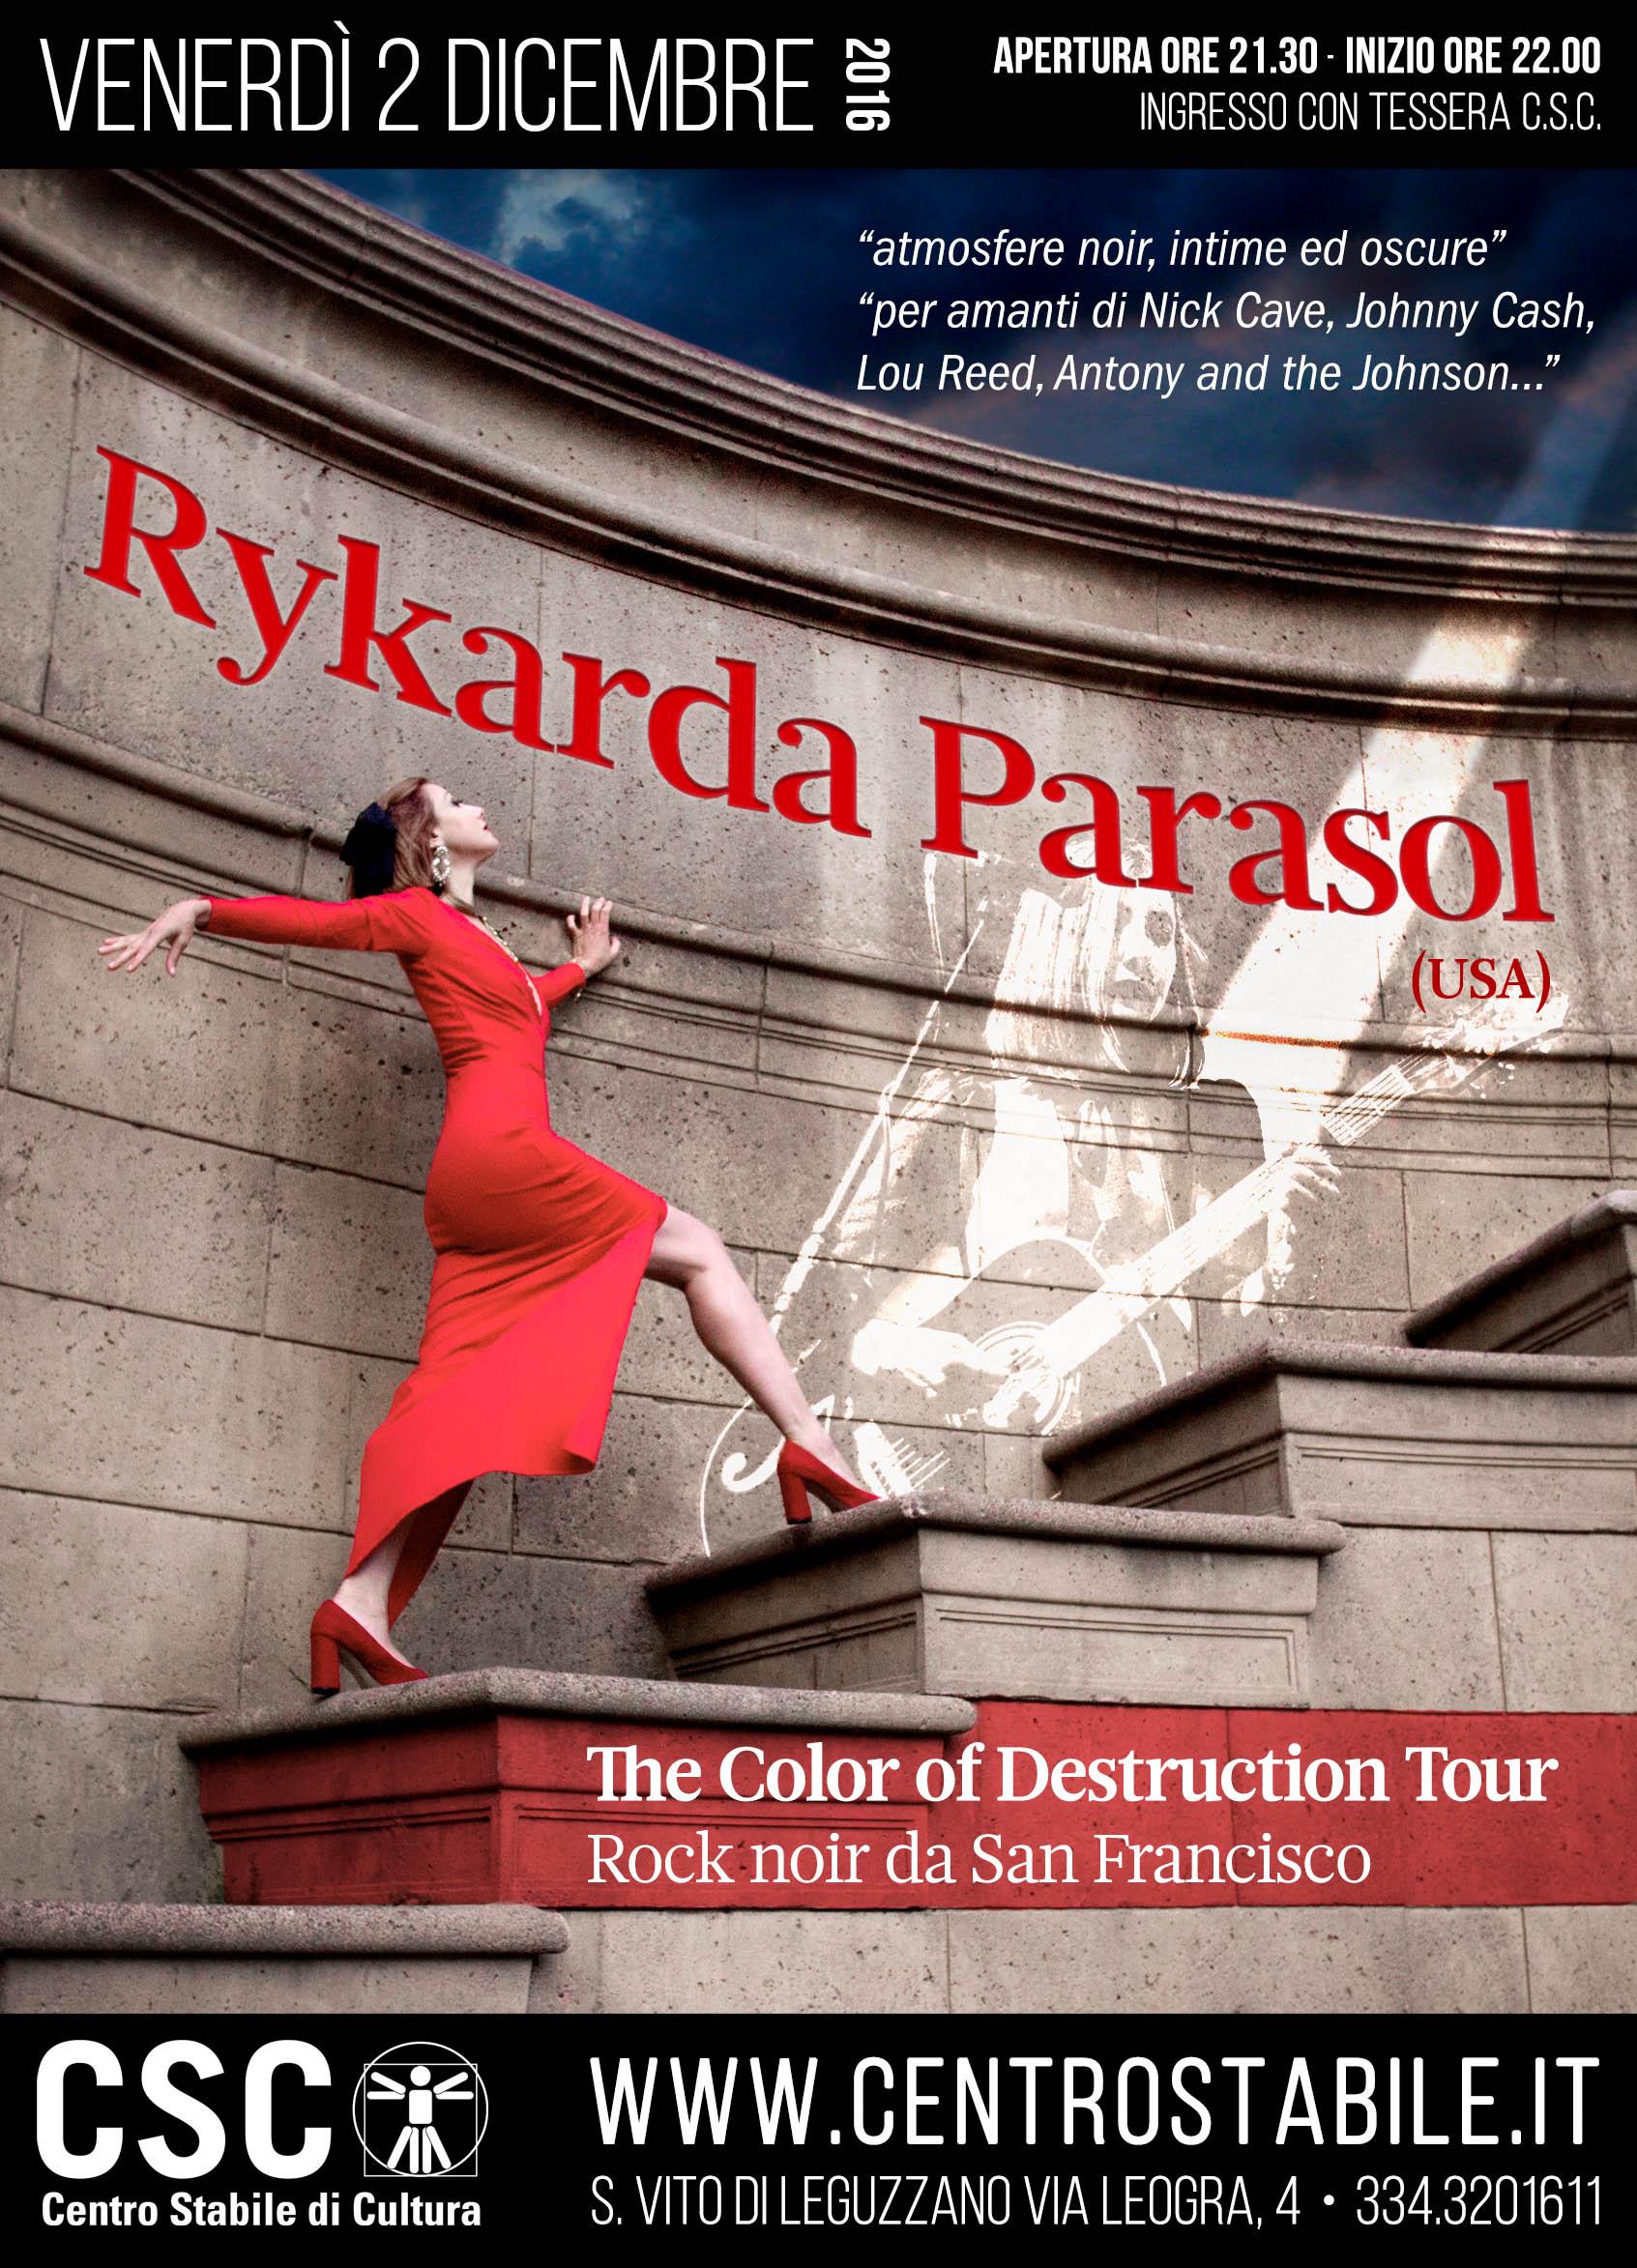 _CSC-flyer_rykardaparasol_sm.jpg